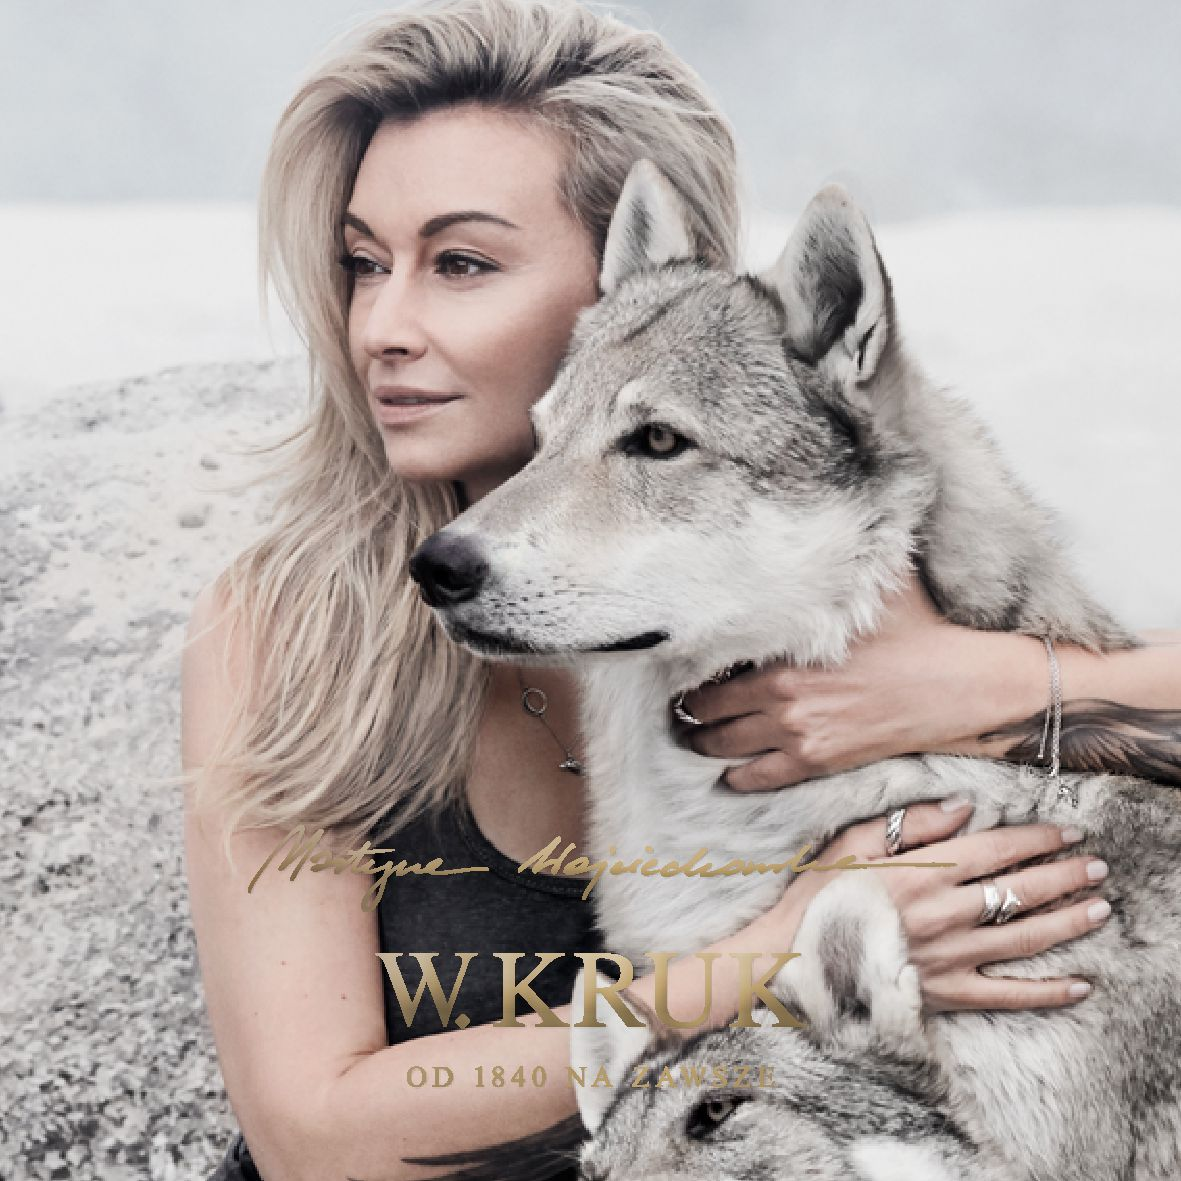 W. KRUK:  Katalog - Freedom Wolf 16.02.2021